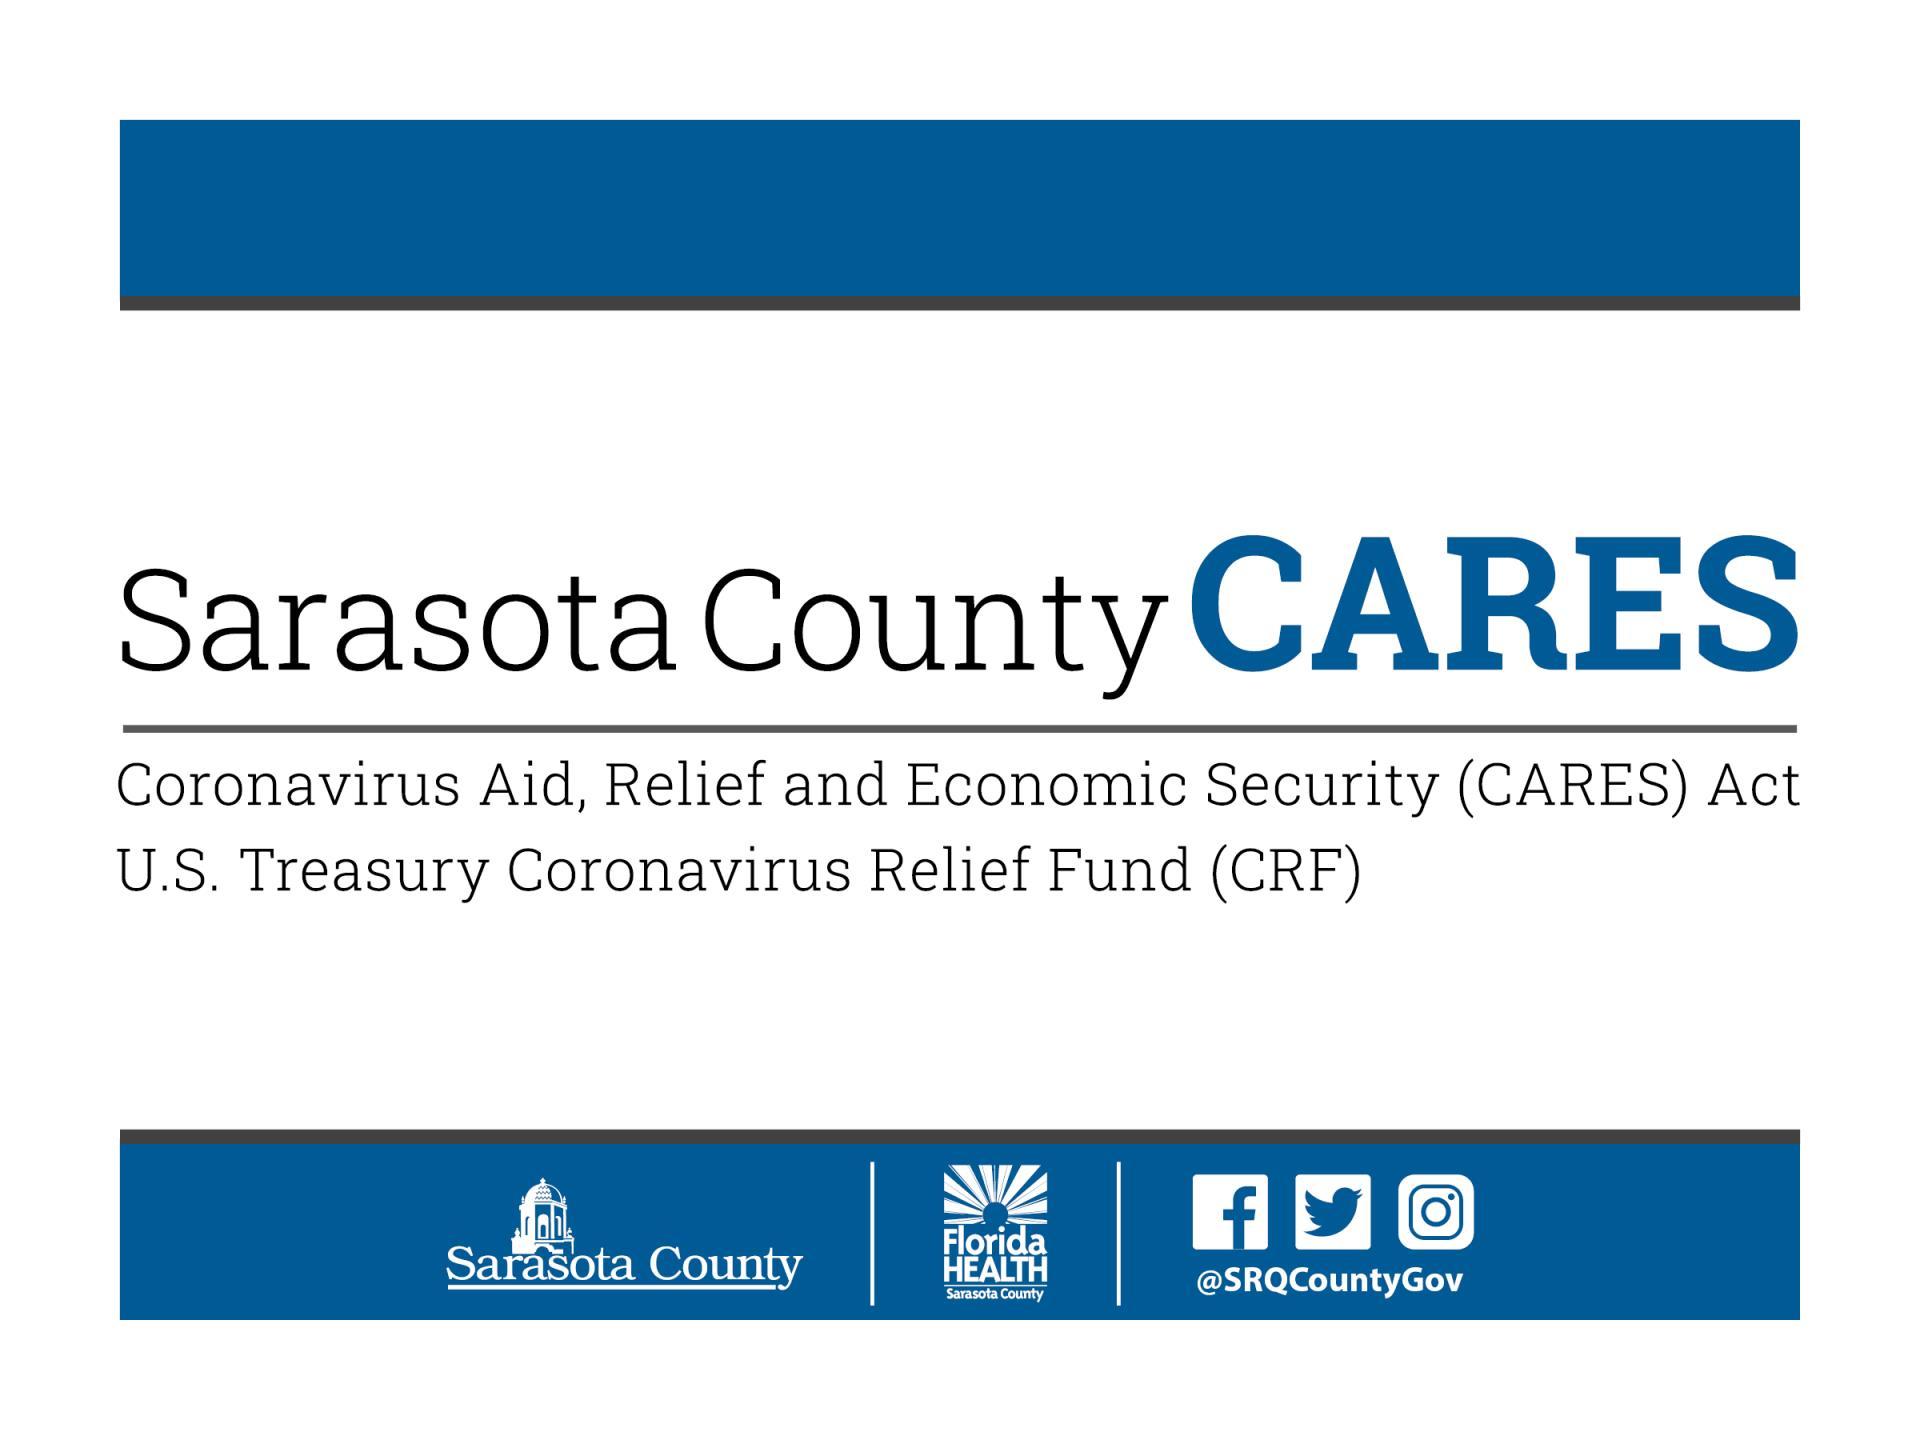 Sarasota County launches CARES Act Funds application process | News List |  City of Sarasota